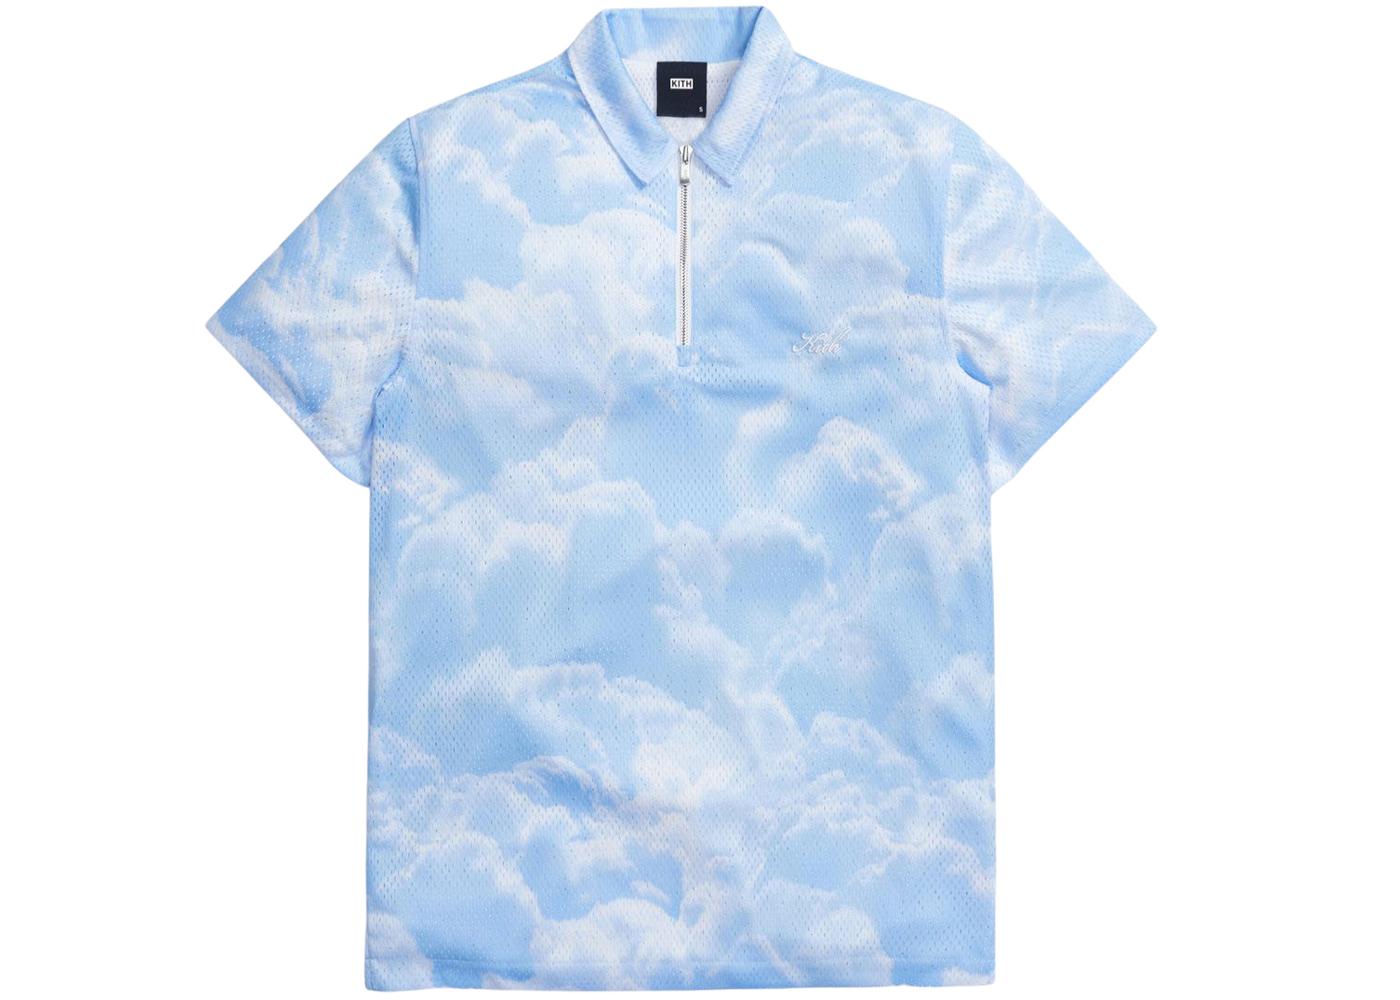 Kith Devoe Zip Up Shirt Summitの写真